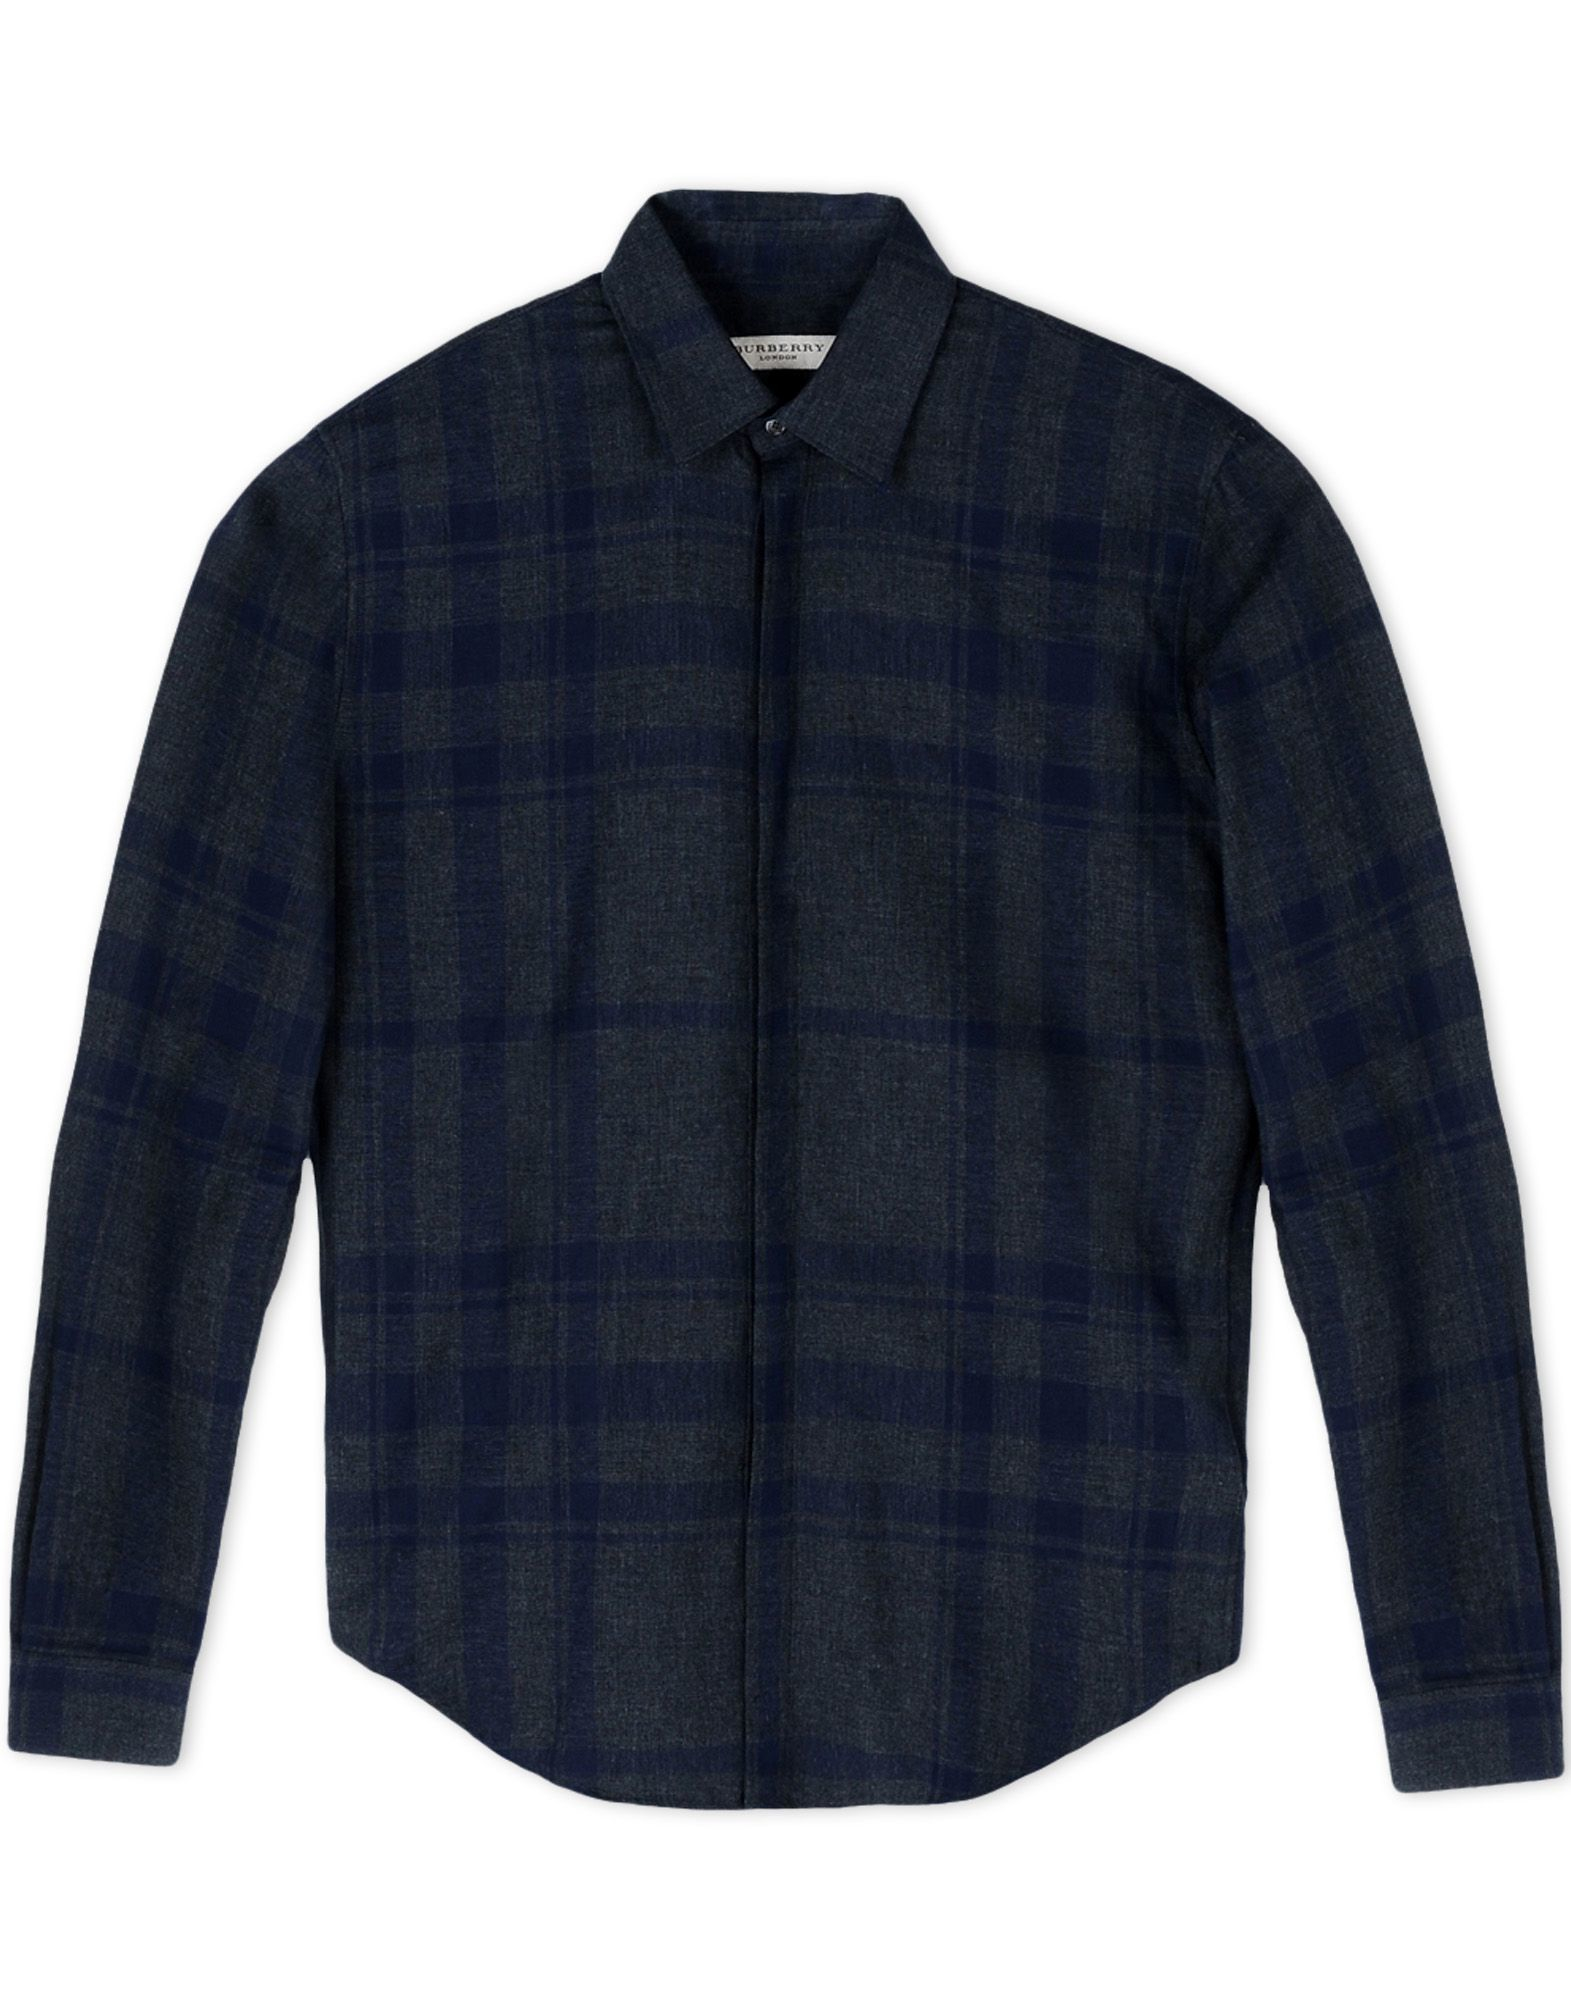 Burberry London Long Sleeve Shirt In Gray For Men Steel